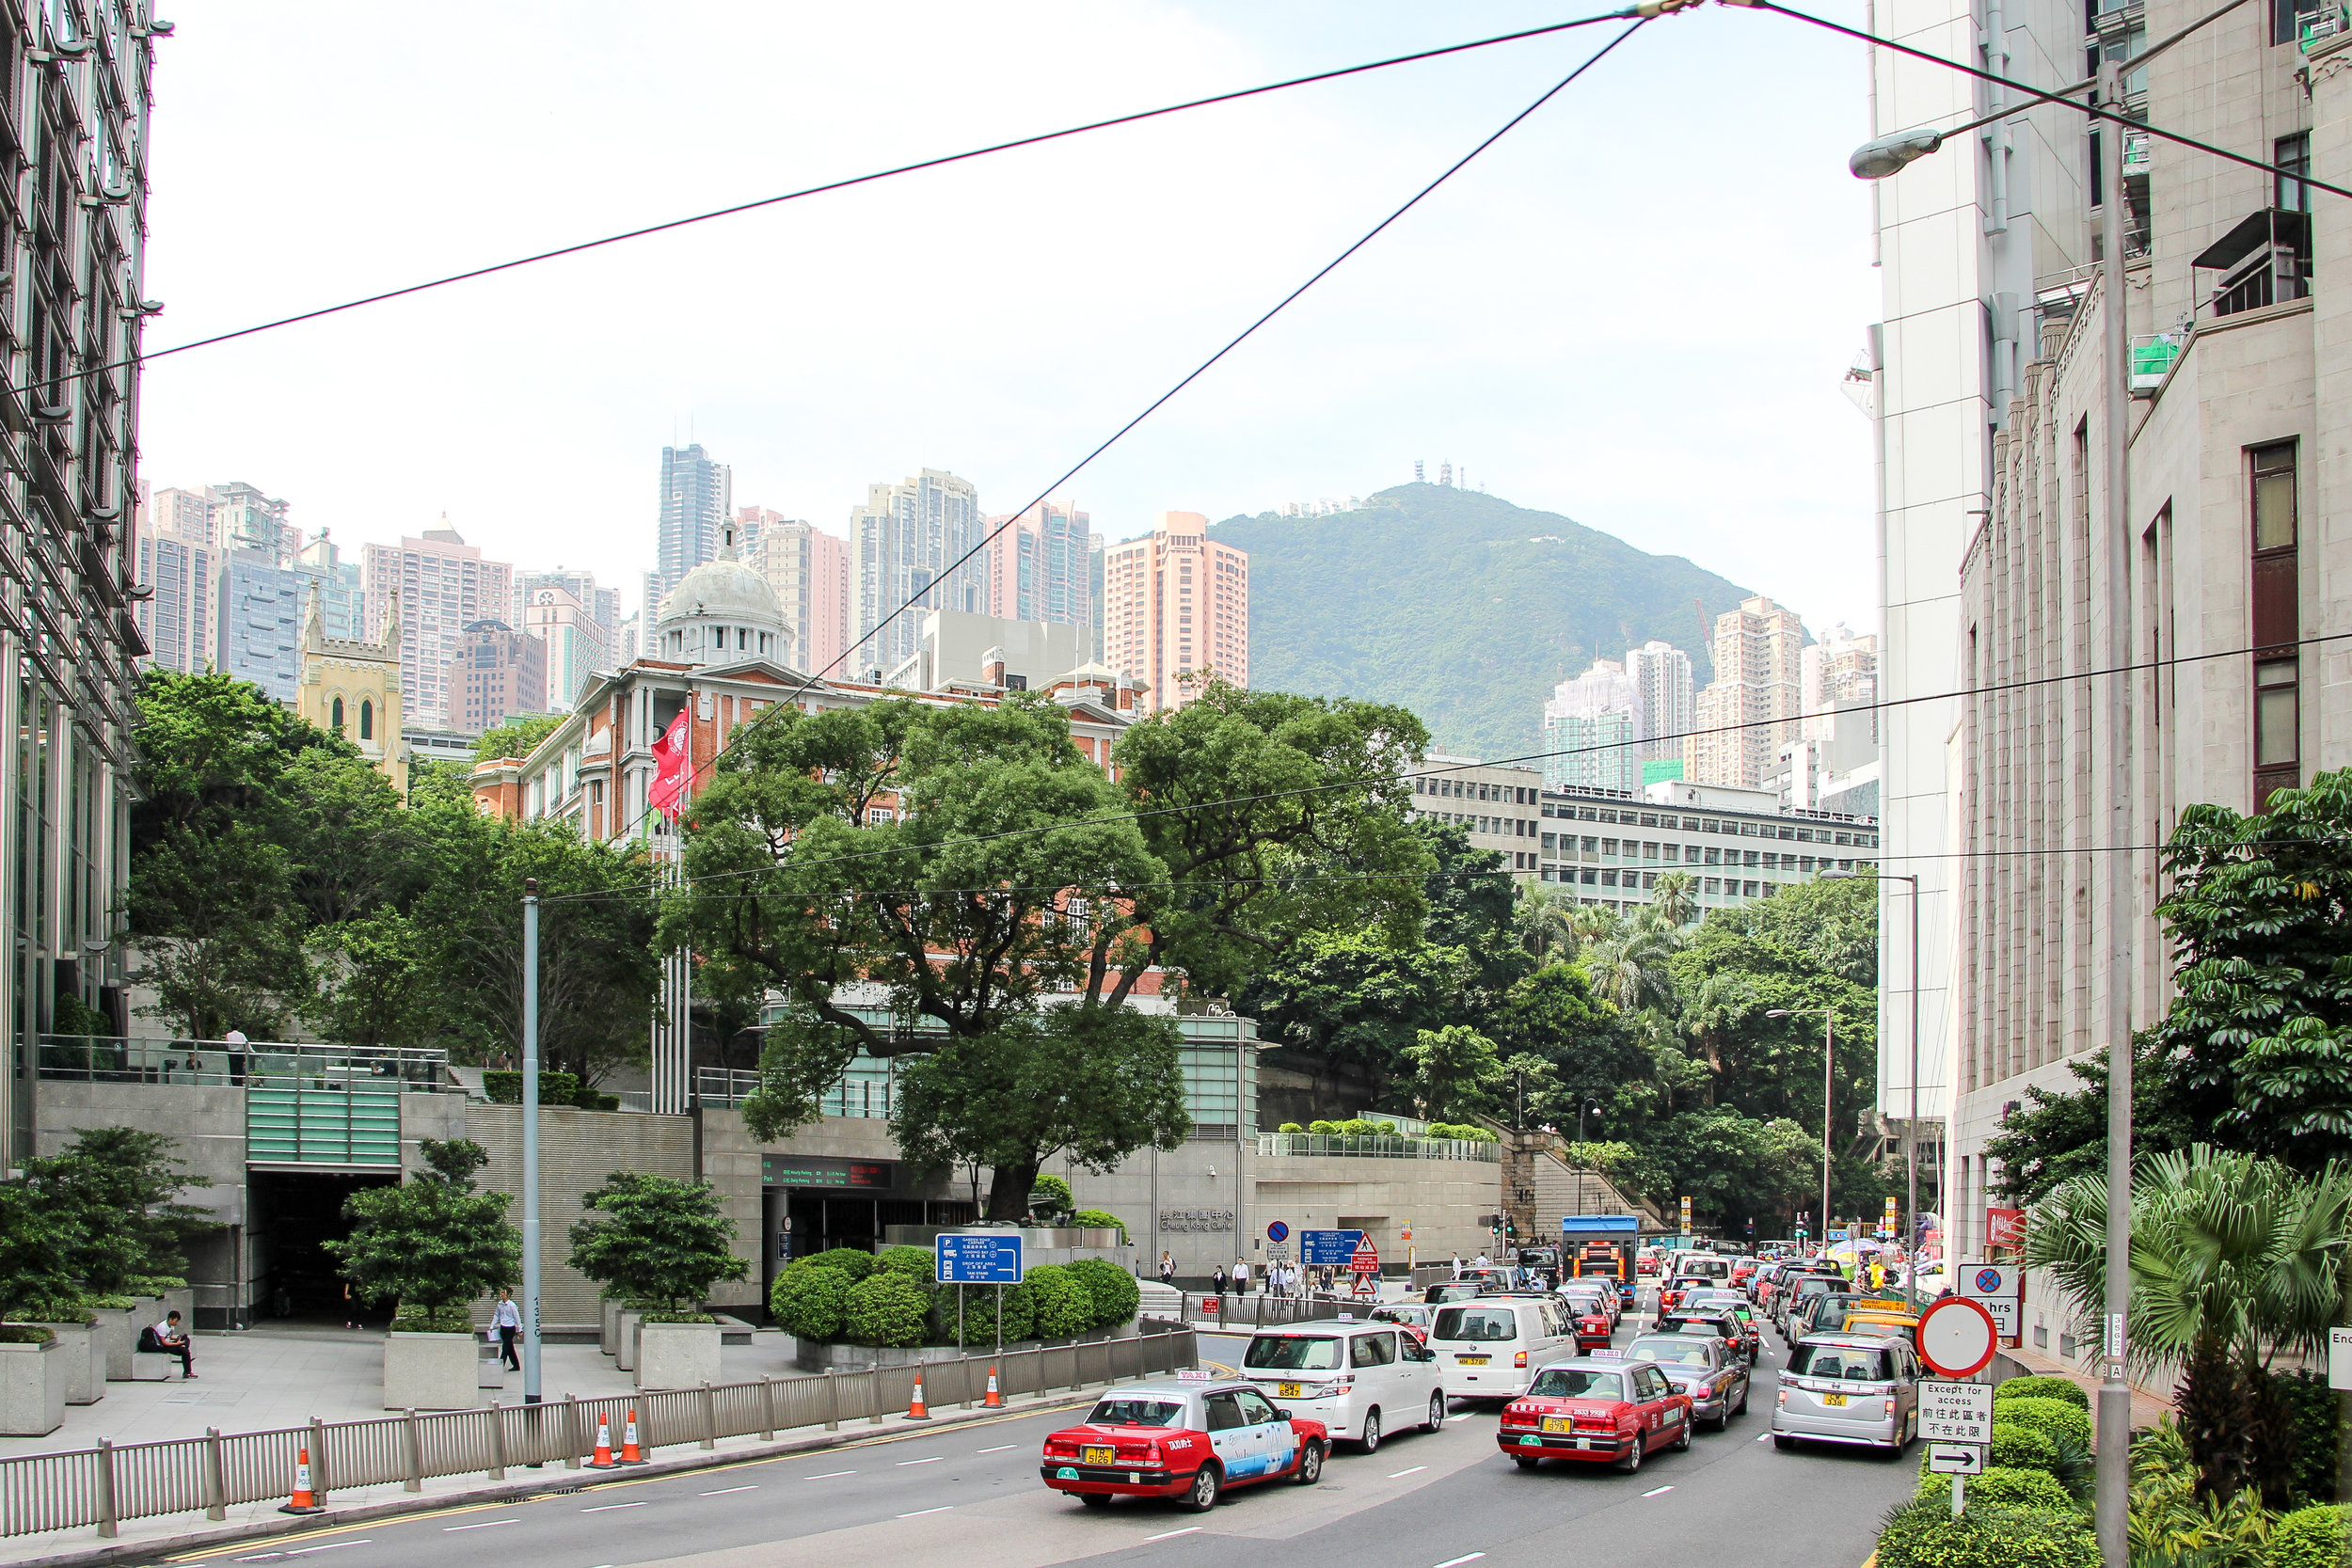 Hong Kong, Hong Kong Island, street photography, traffic, Asia | DoLessGetMoreDone.com |